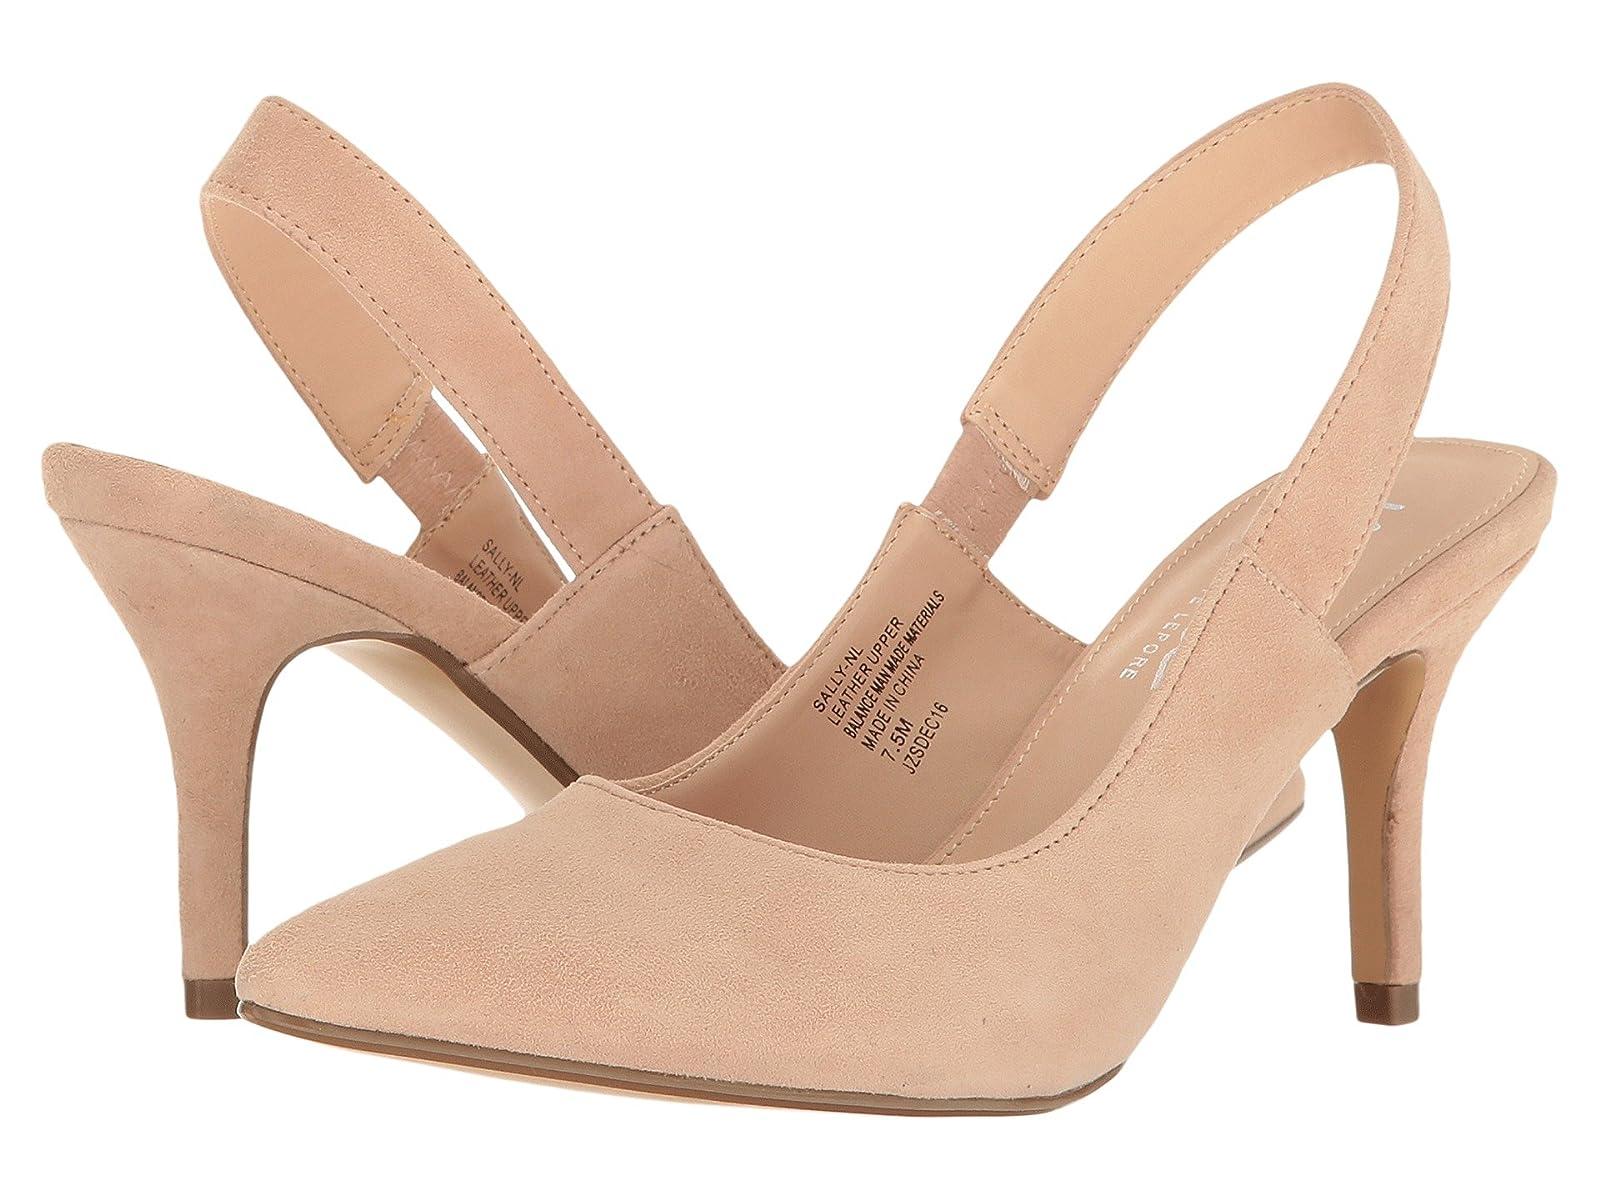 Nanette nanette lepore Sally-NLCheap and distinctive eye-catching shoes